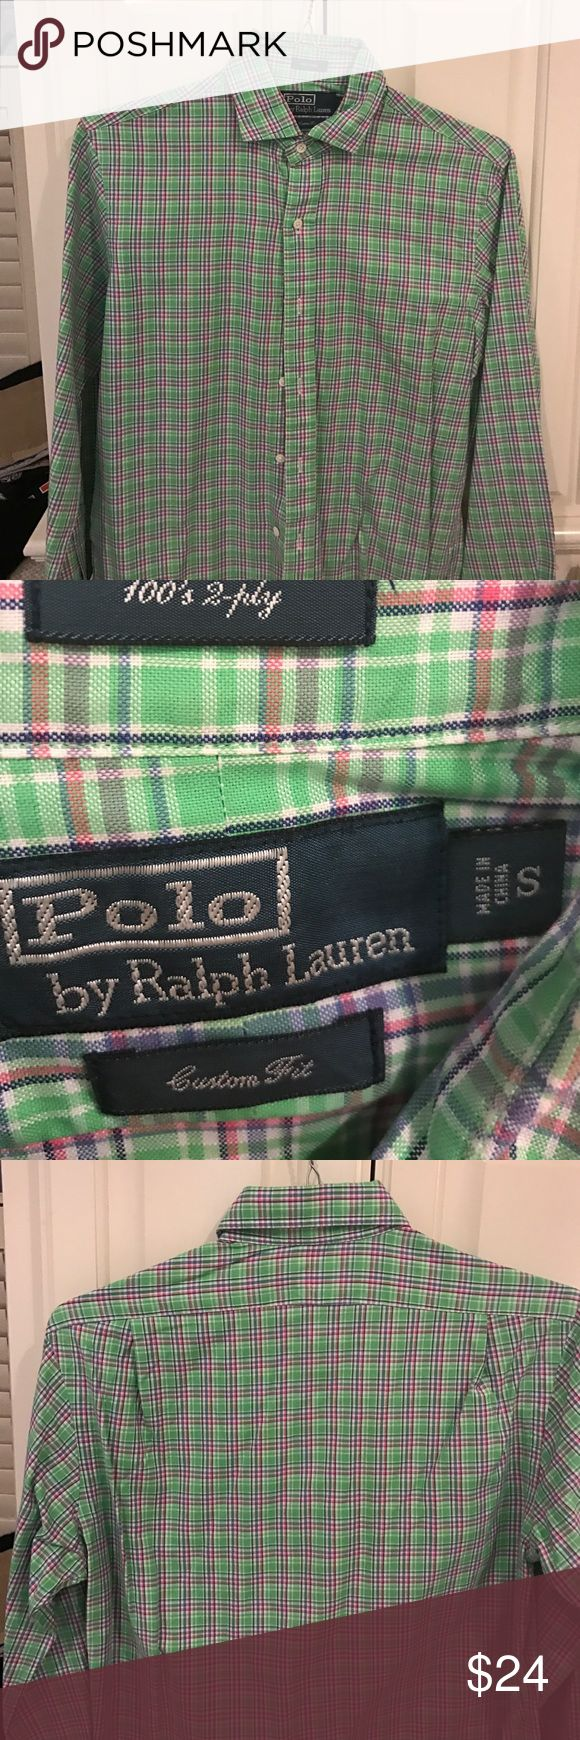 Men's shirt Men's Ralph Lauren polo custom fit shirt Polo by Ralph Lauren Shirts Dress Shirts